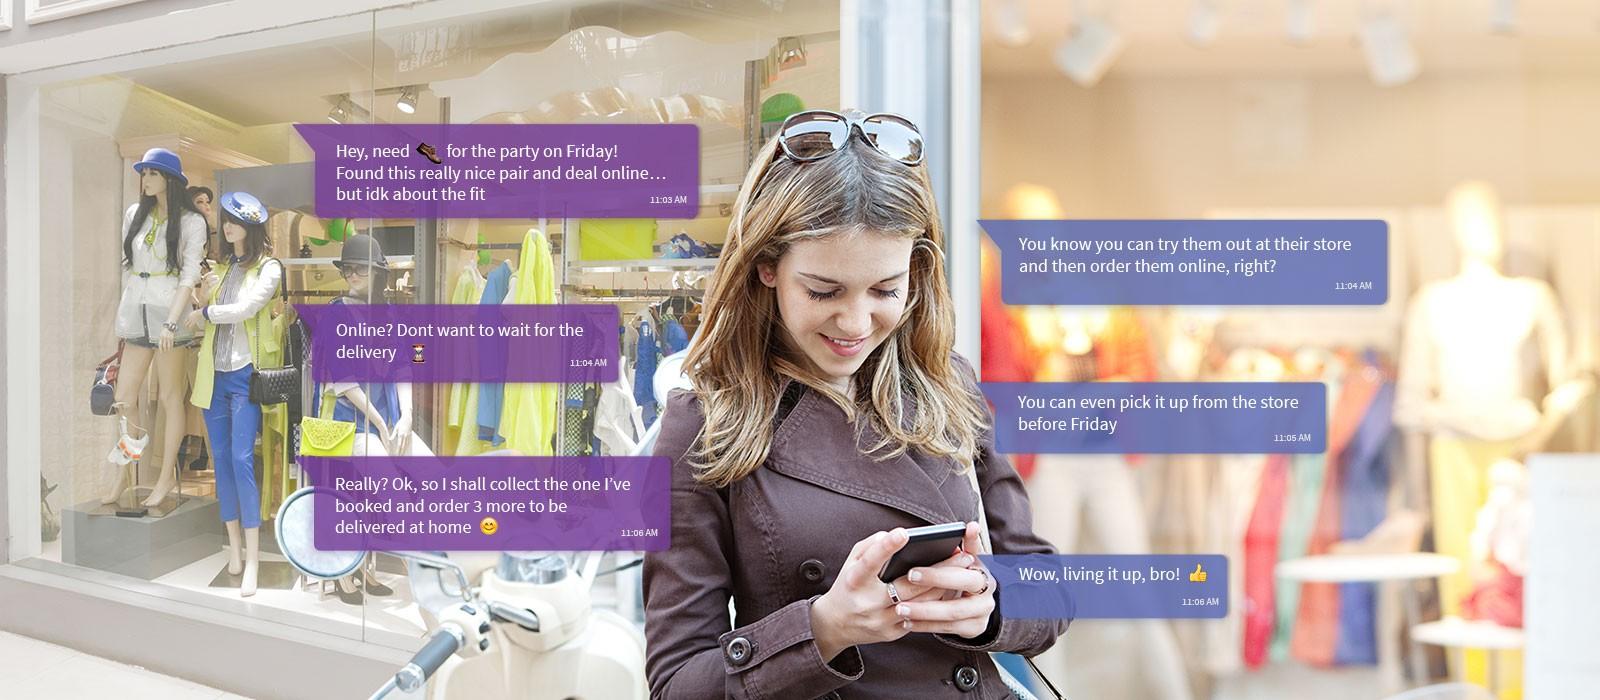 Understanding OC Retail better